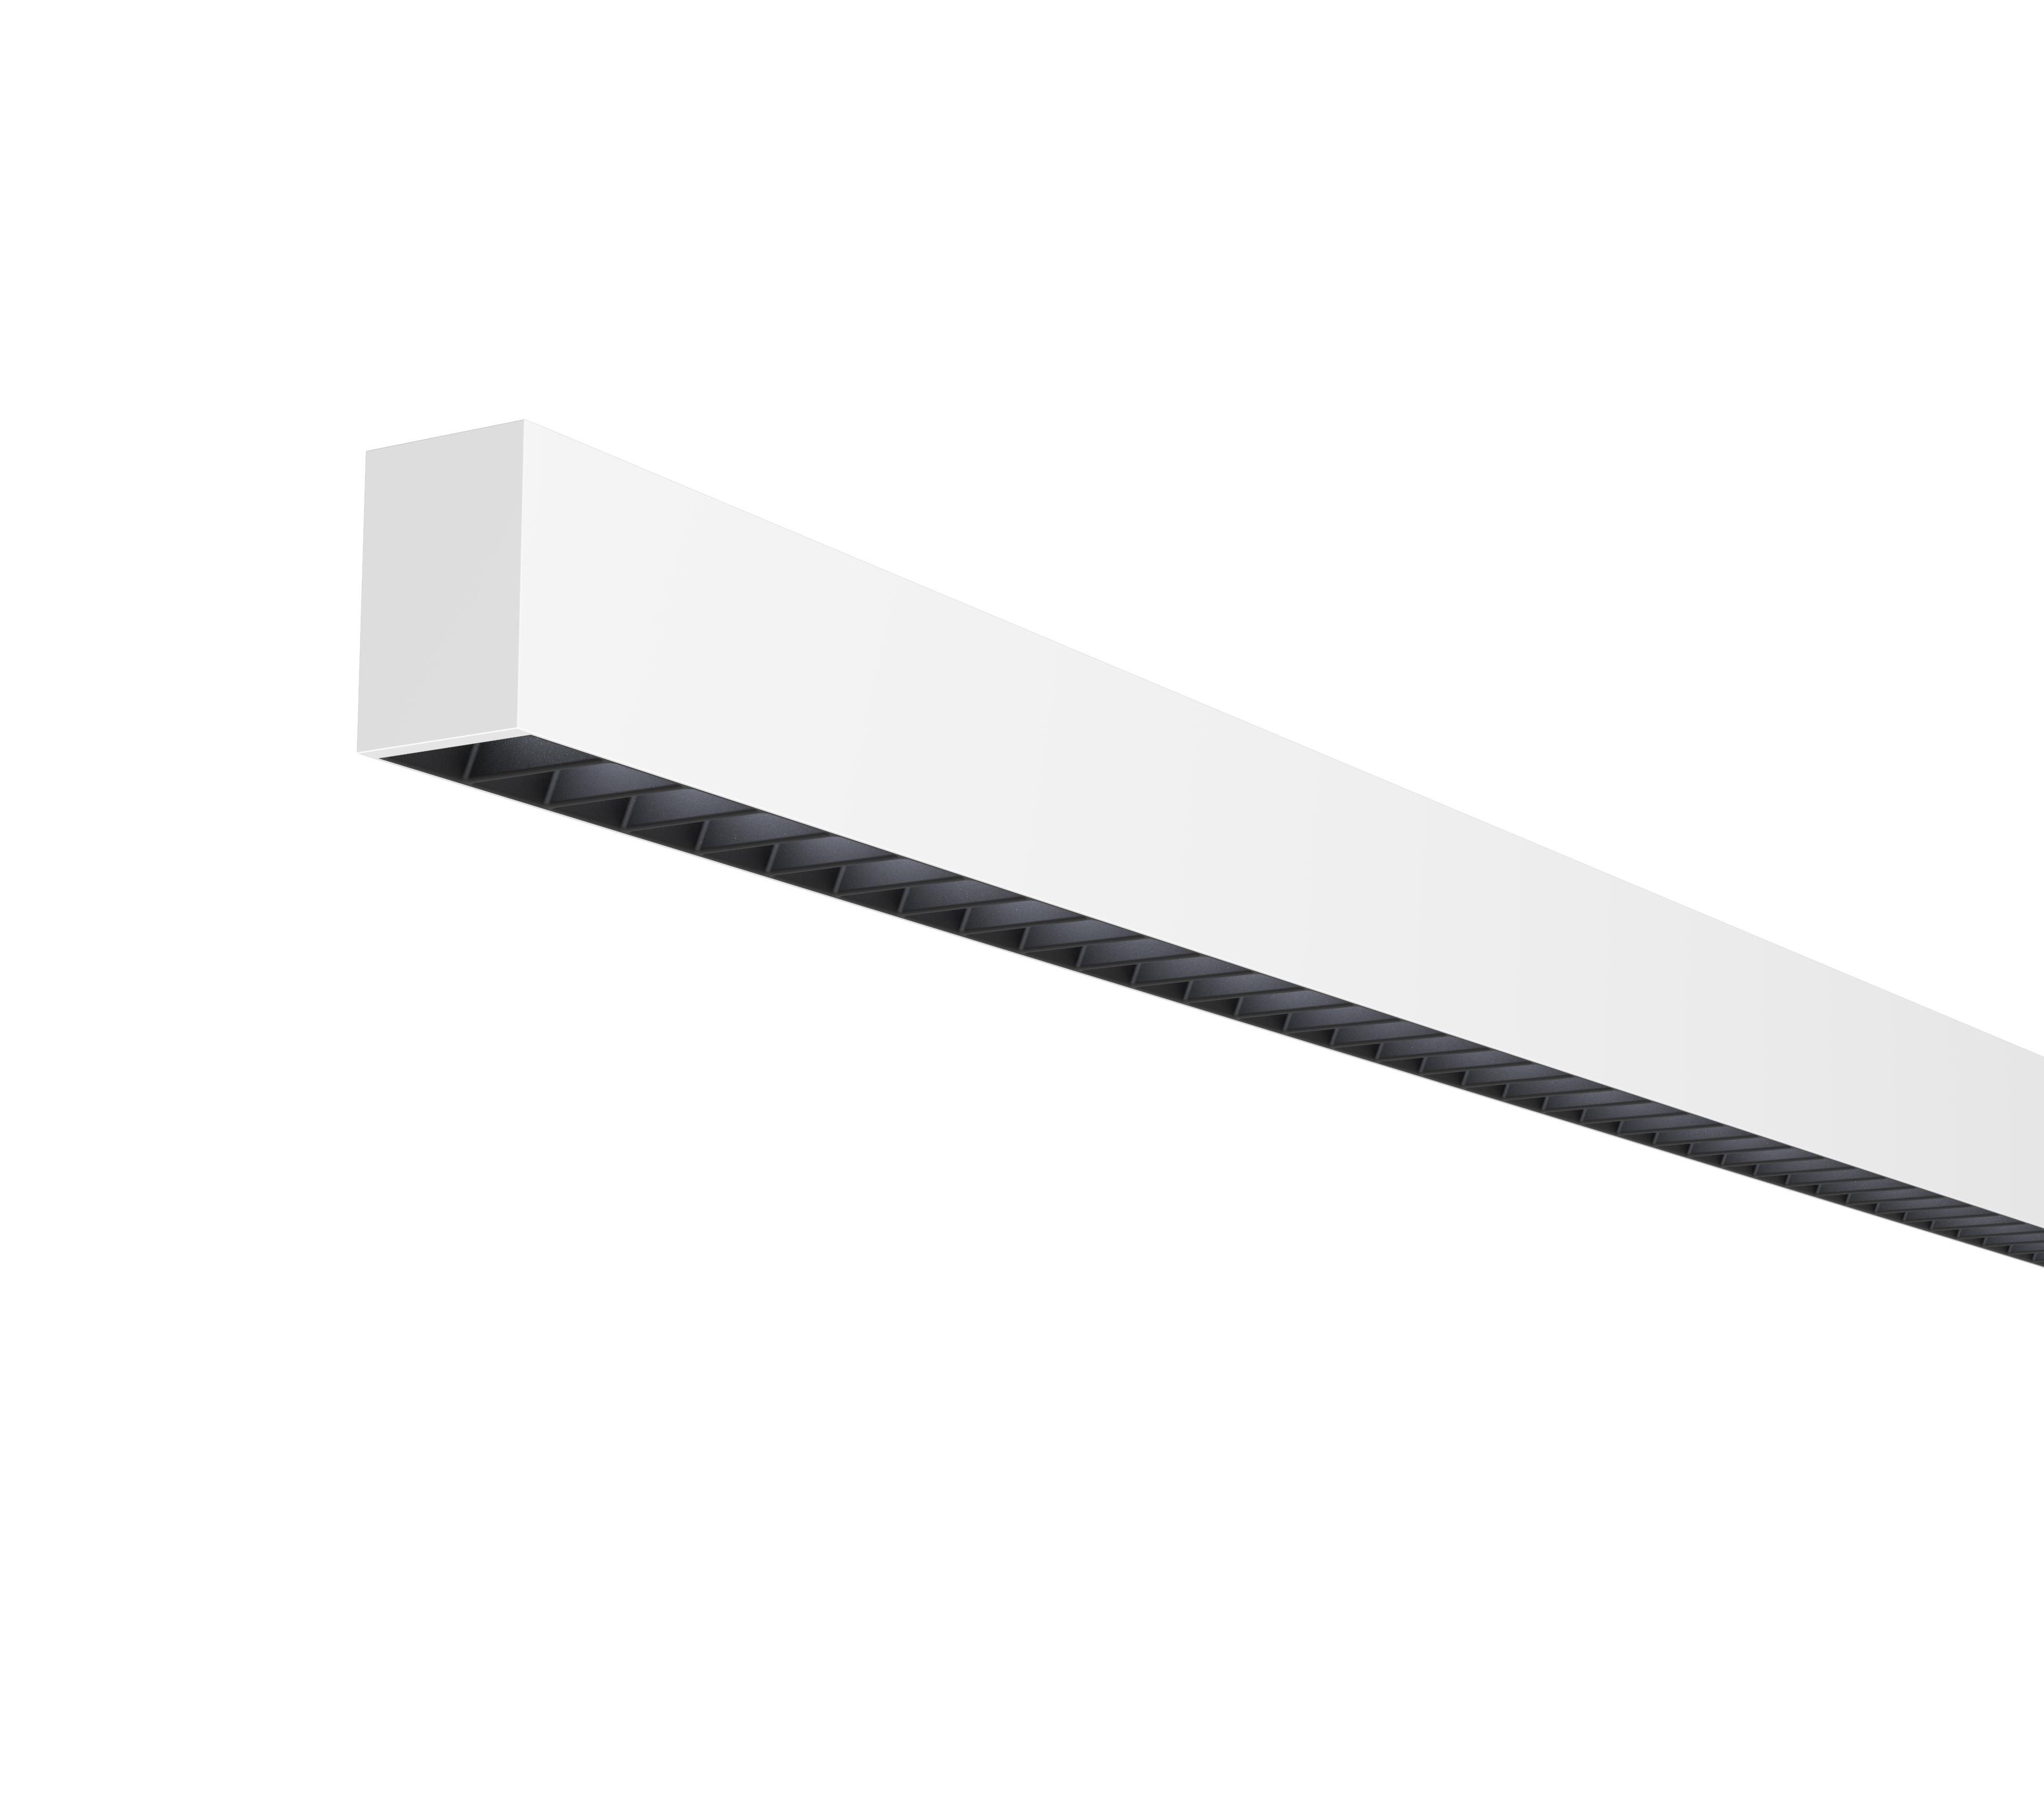 White surface with black baffle